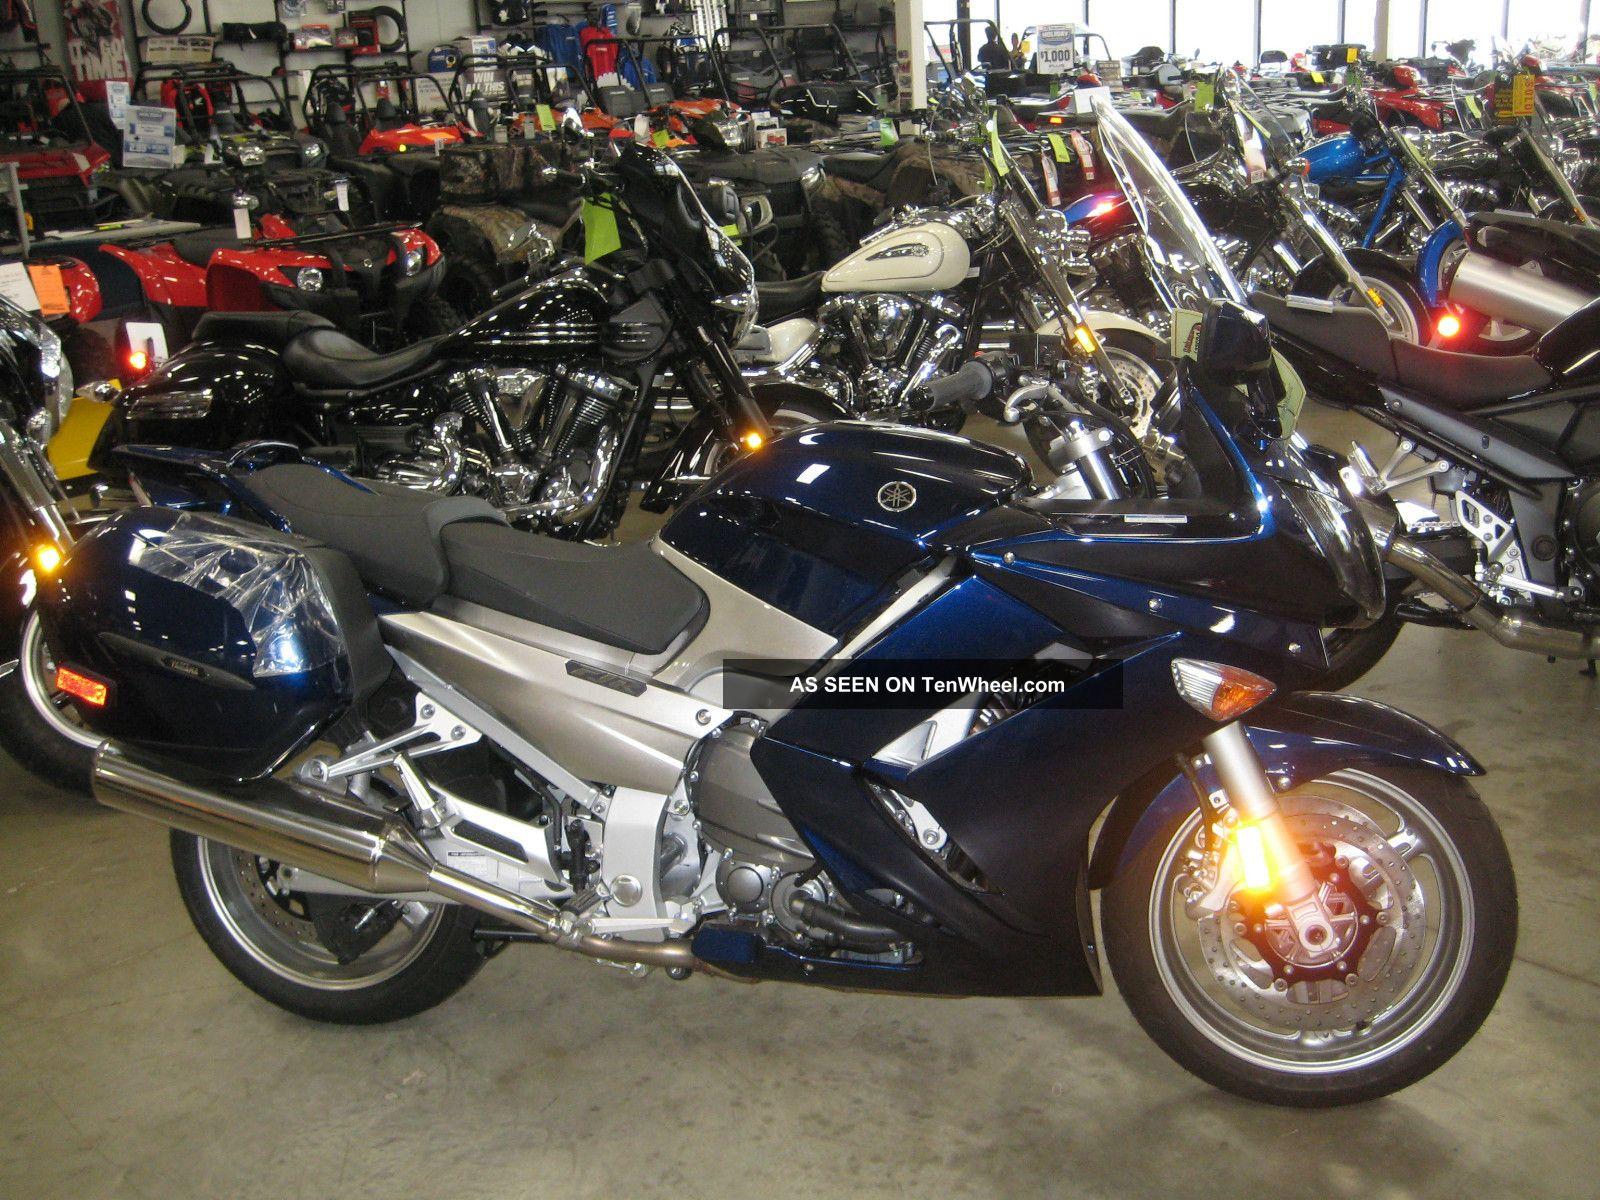 2012 Yamaha Fjr 1300 Abs Motorcycle Fjr1300 Bike Sport Tour Fjr1300a Touring FJR photo